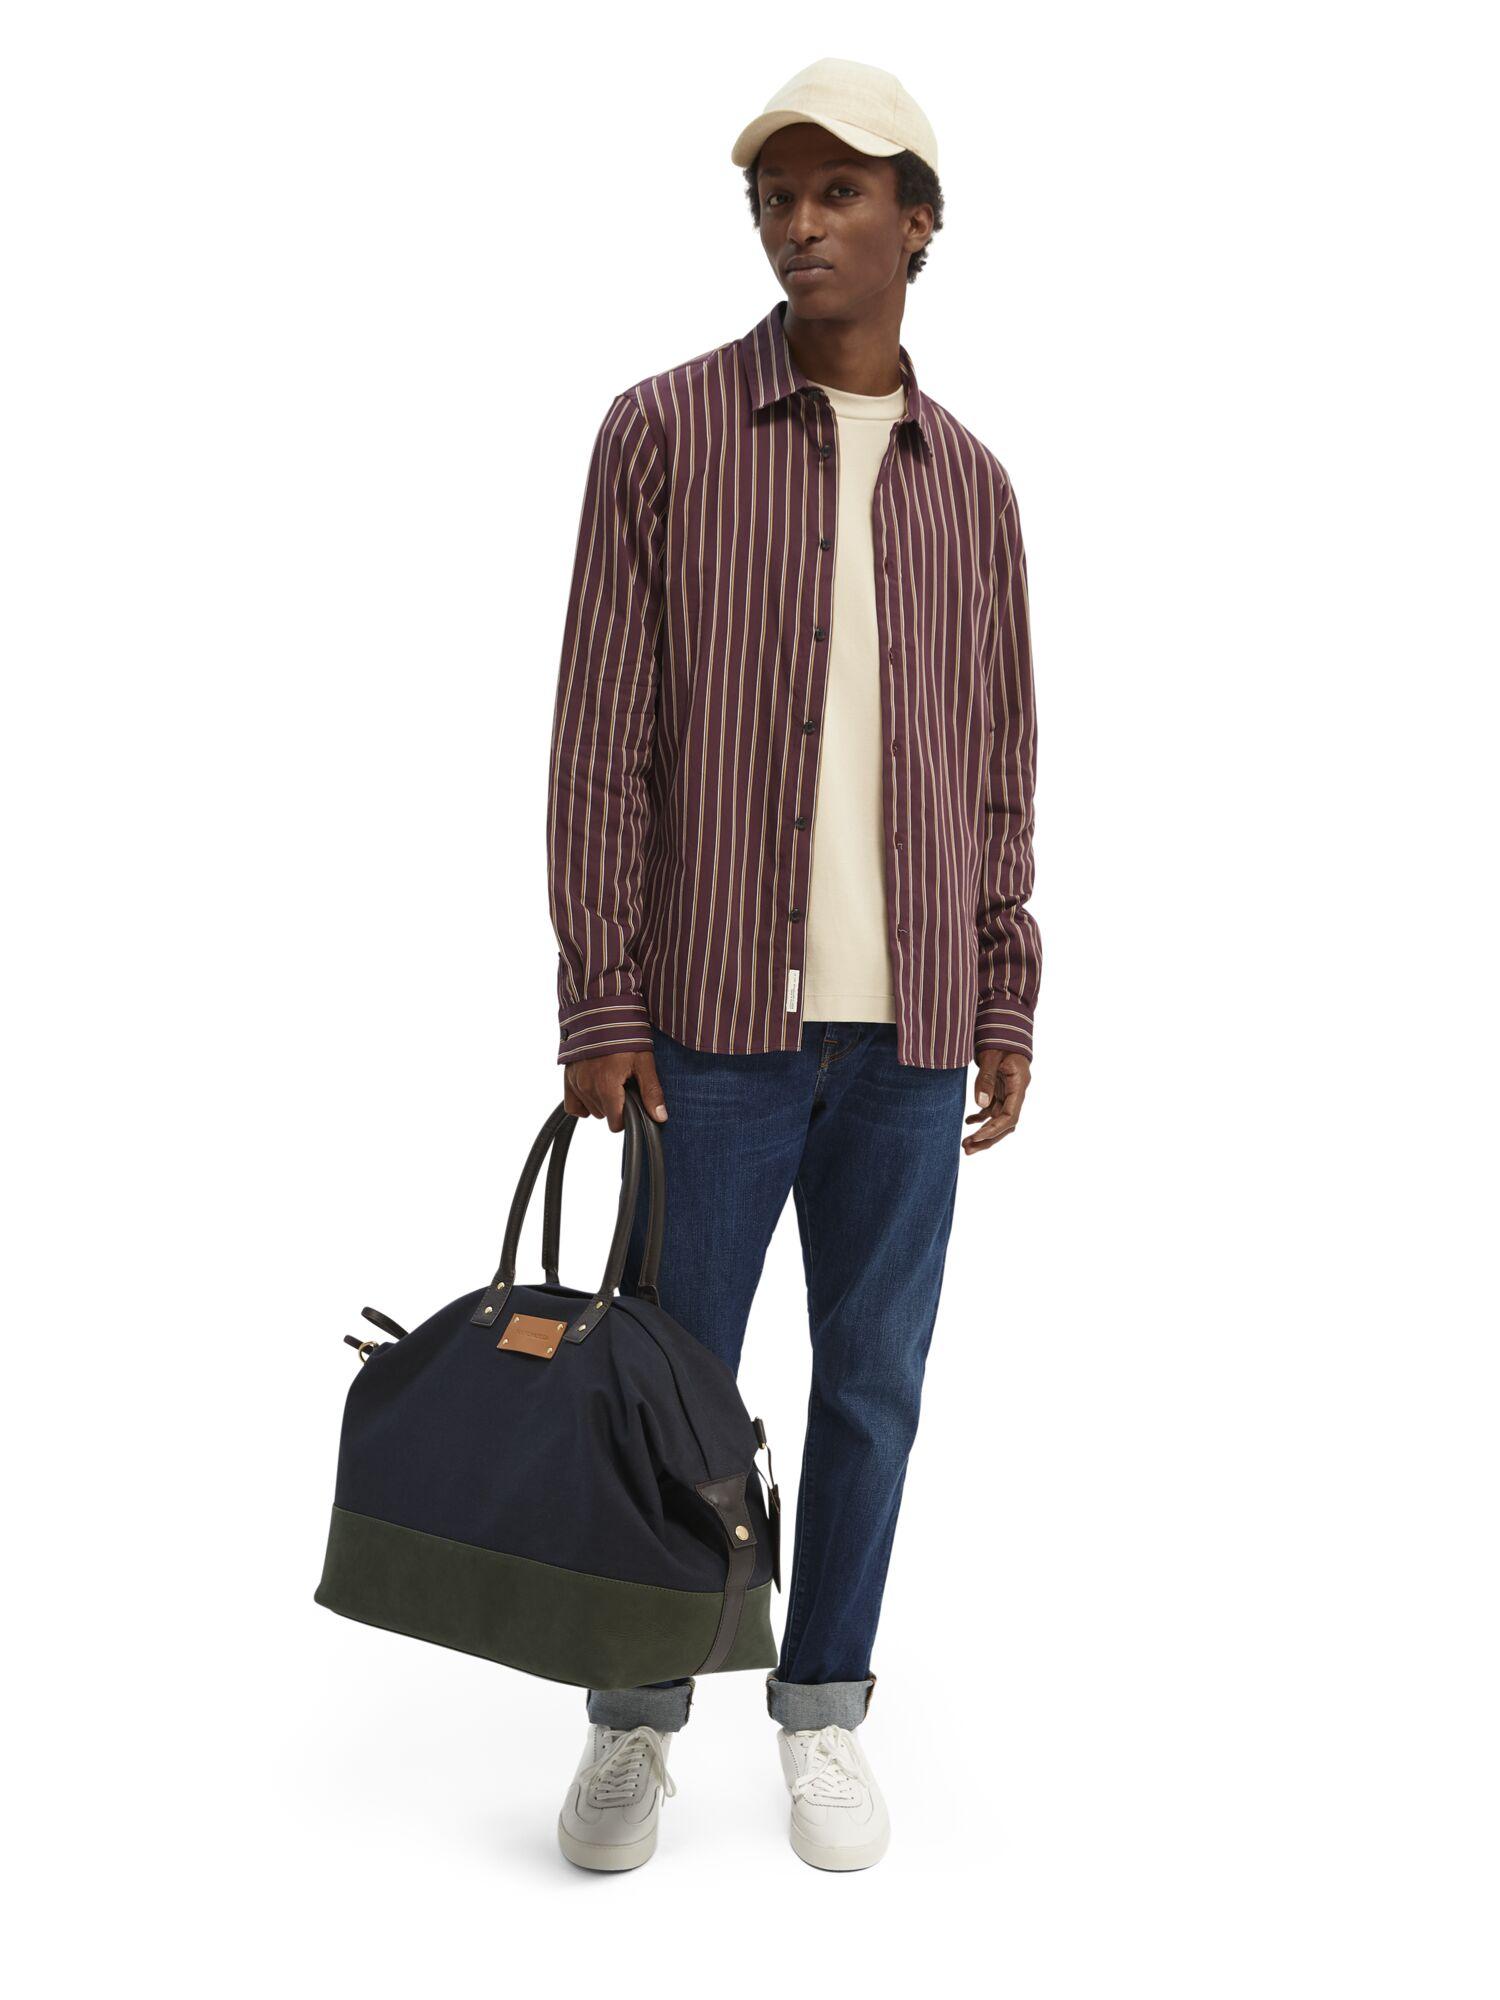 Scotch & Soda | Ralston regular slim jeans recycled cotton blend-Boundless